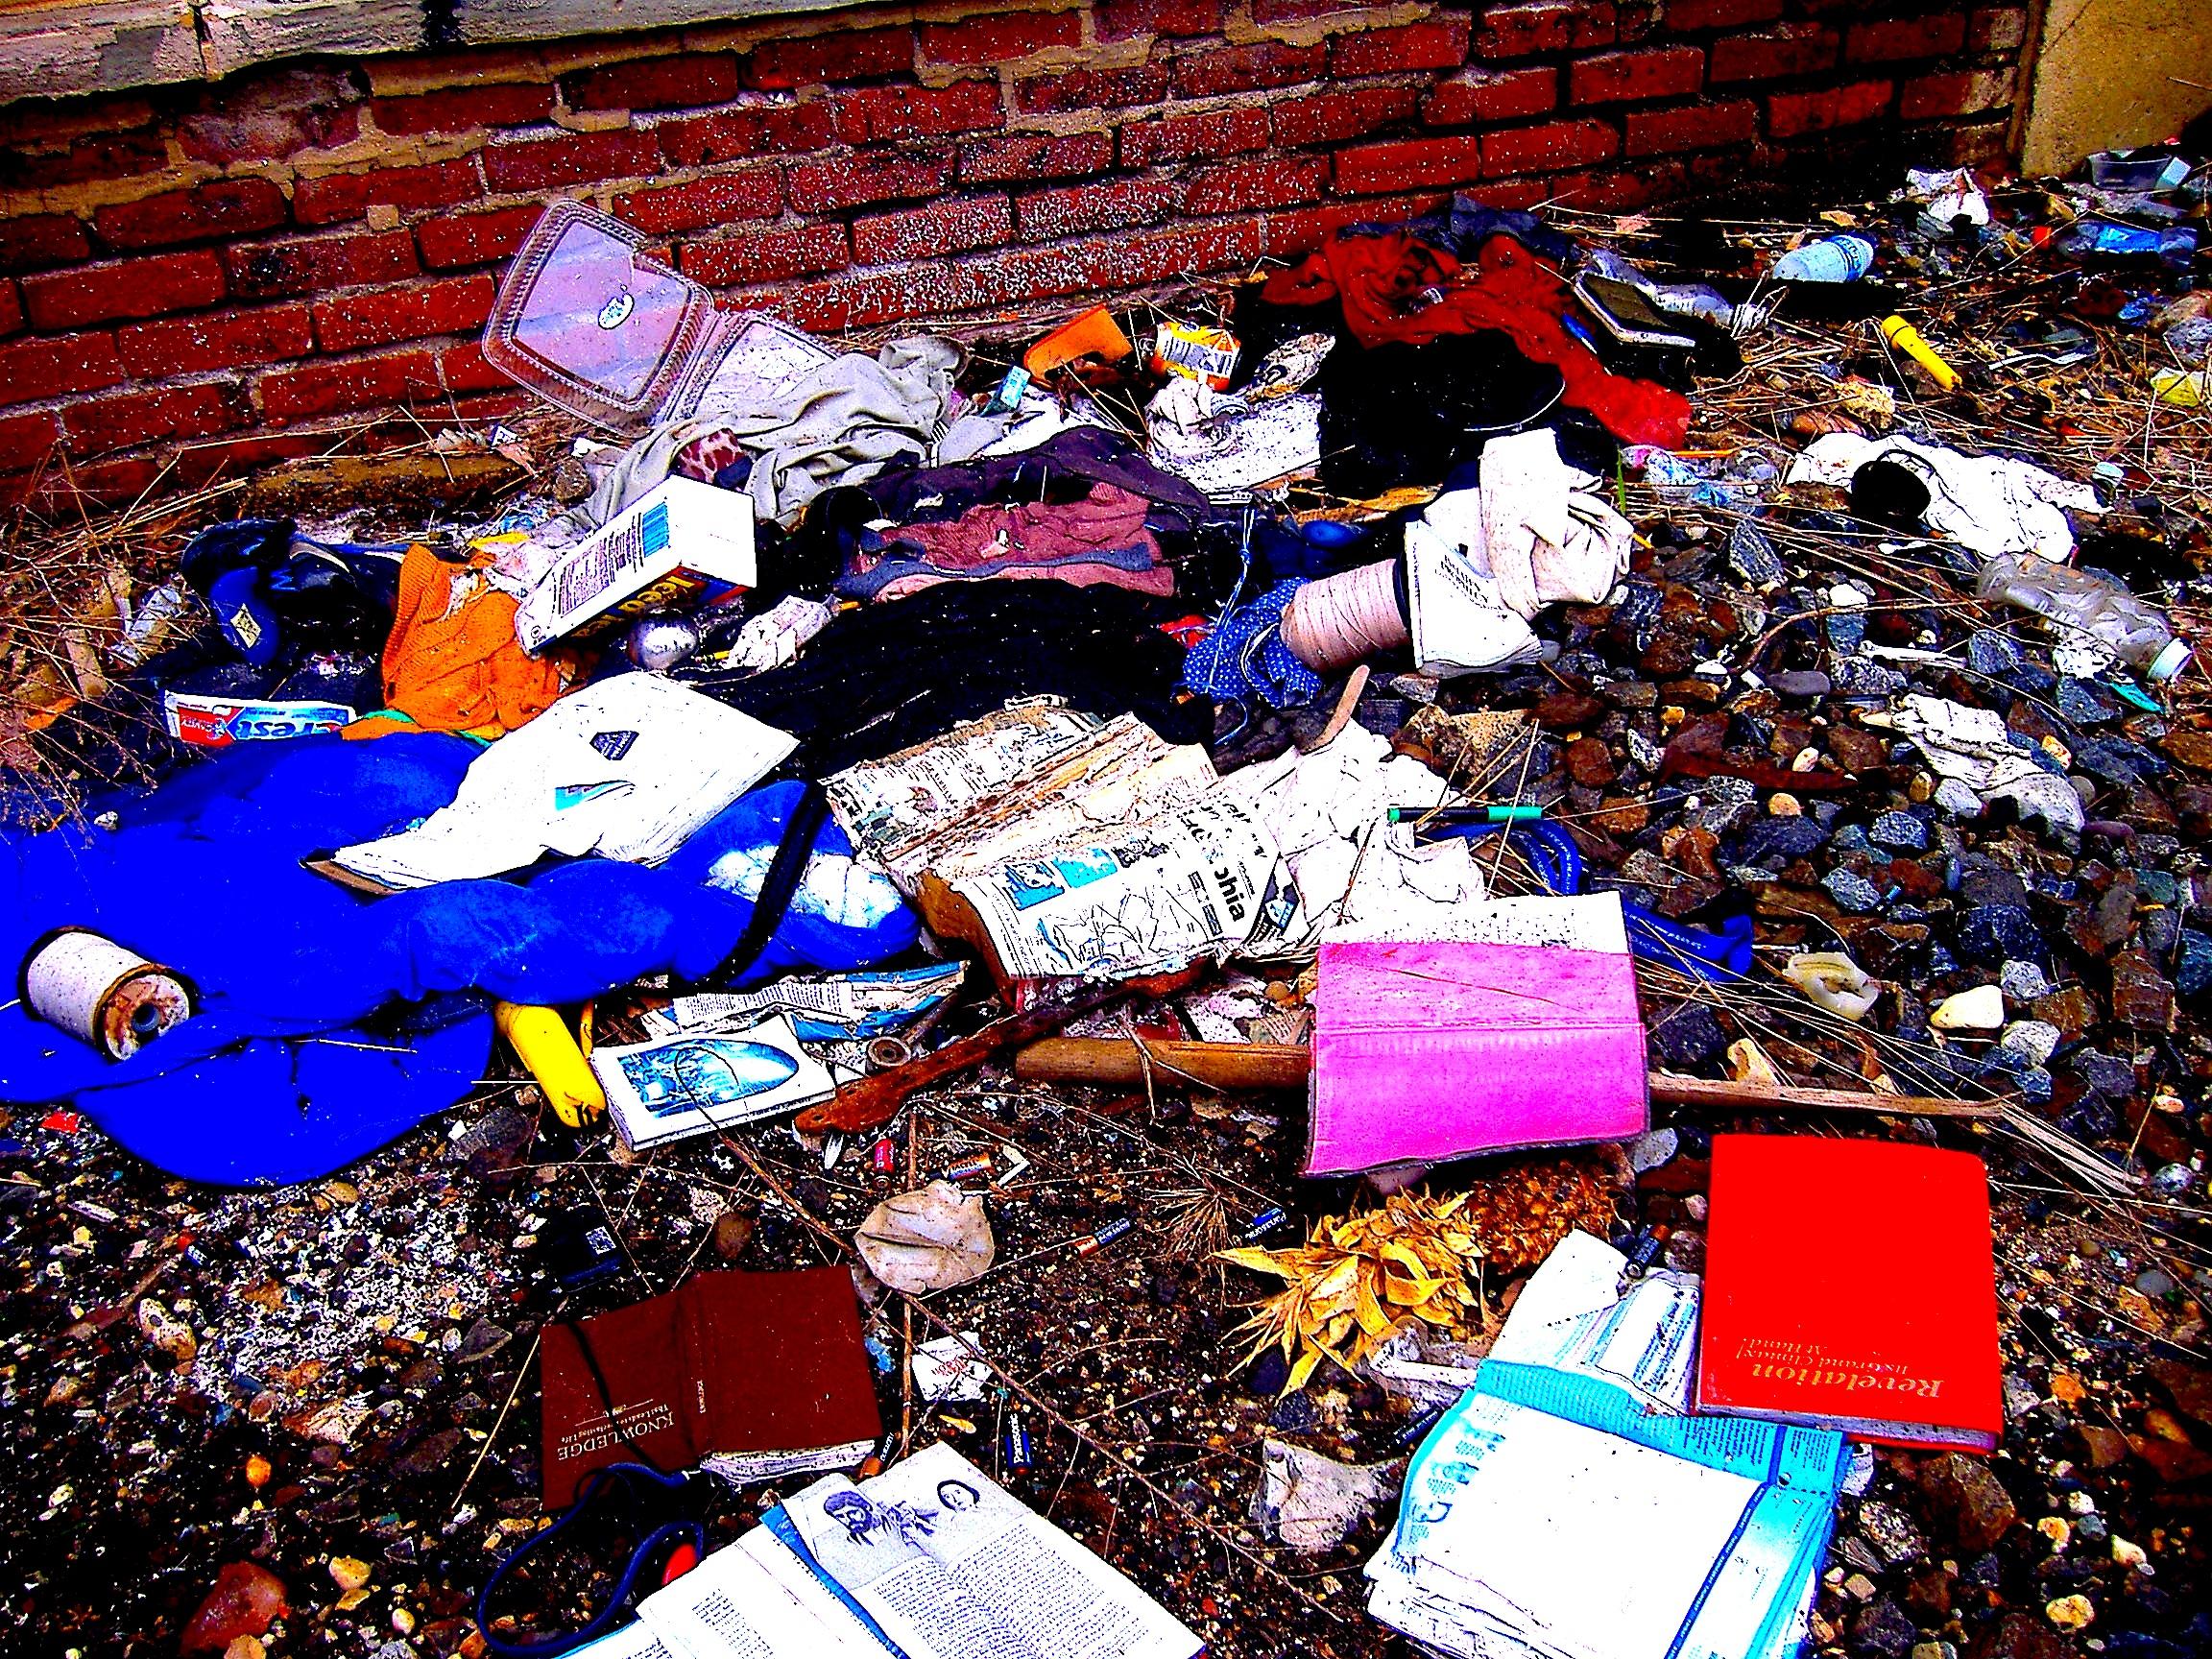 tis-trash-pile.jpg